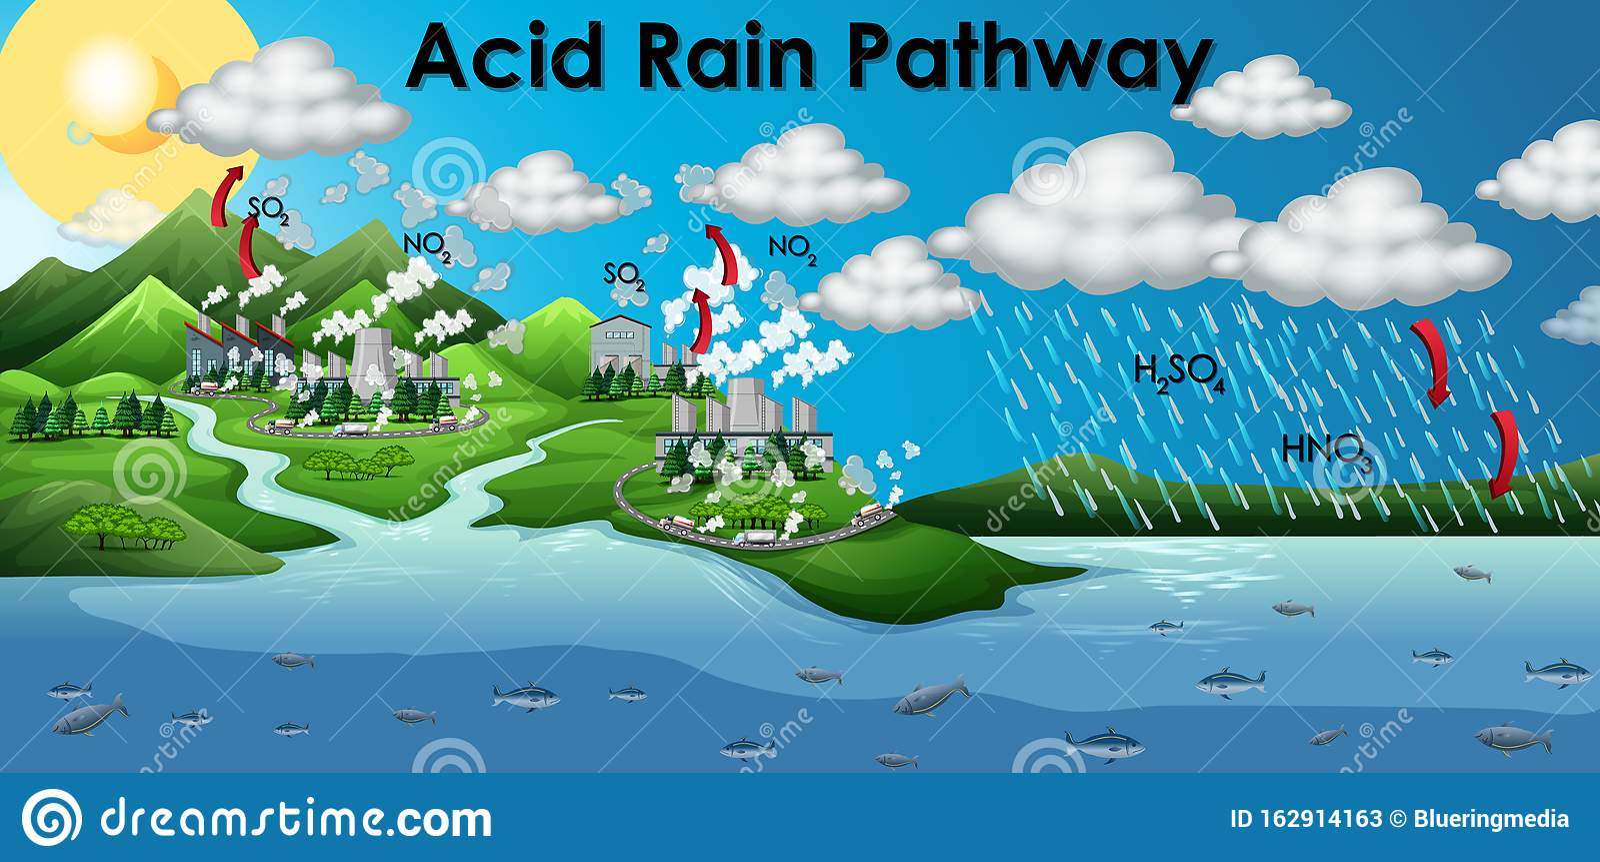 Diagram Showing Acid Rain Pathway Stock Image